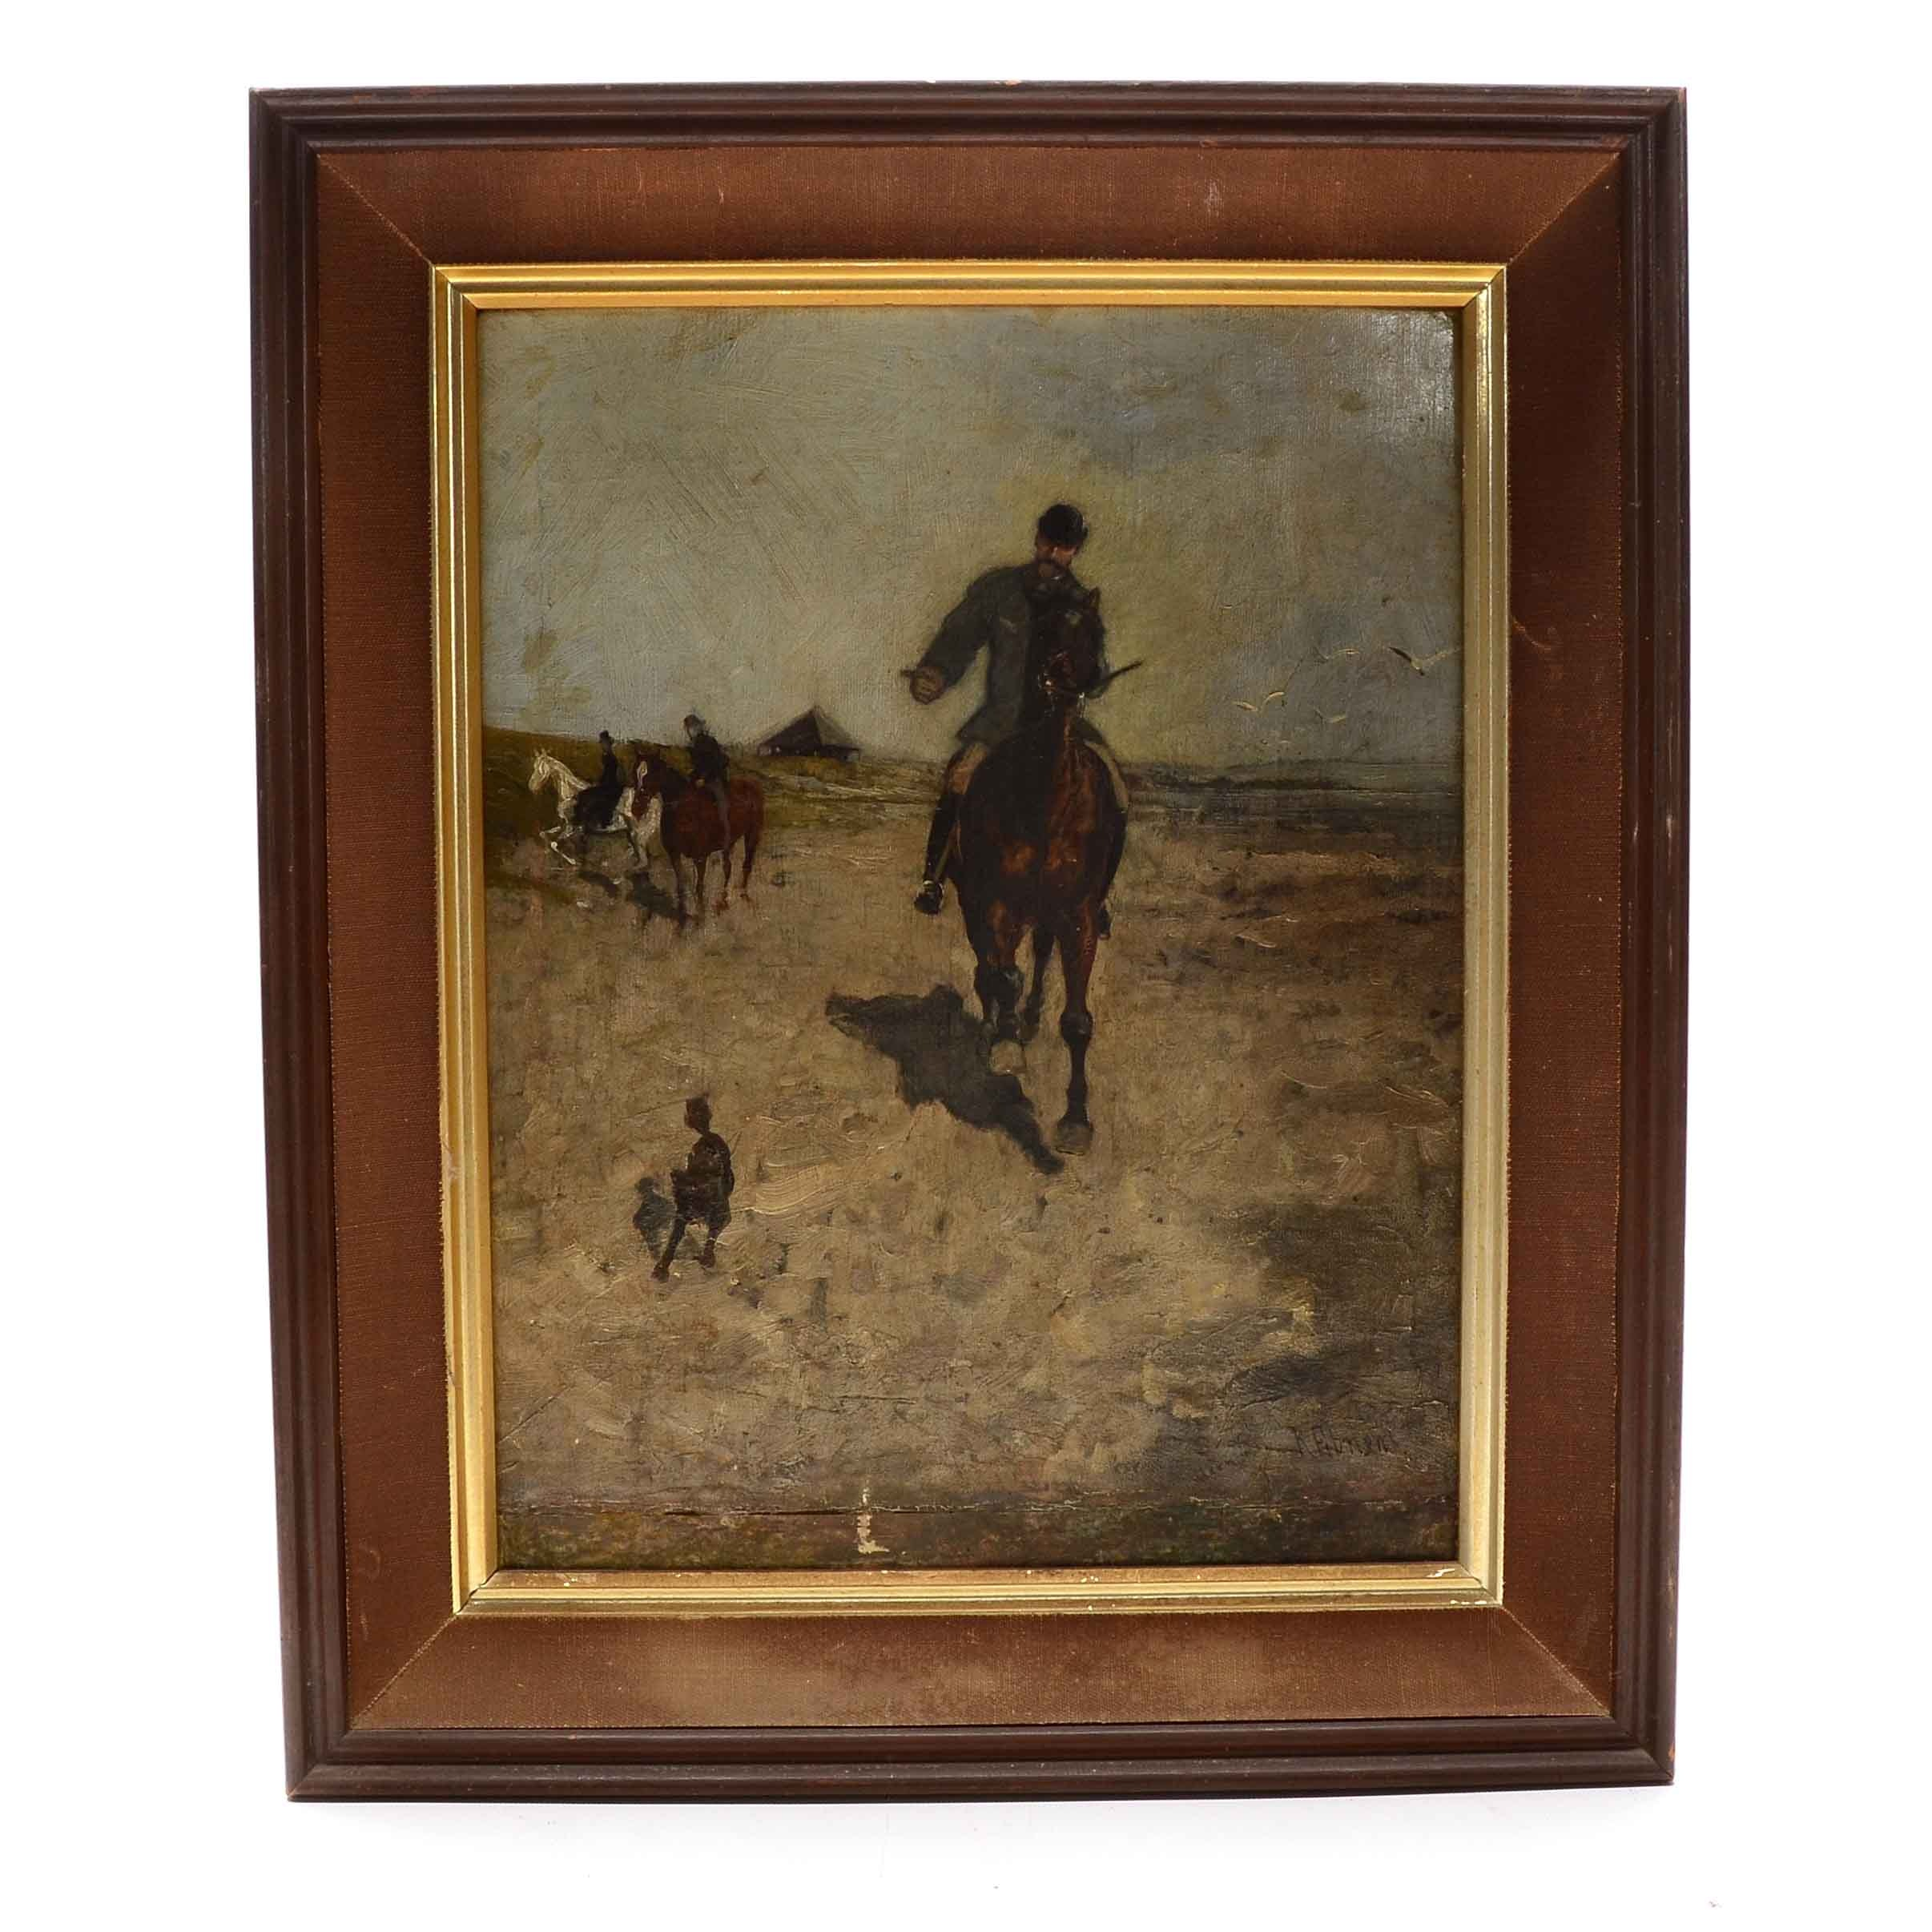 Richard Ebner Original Oil Painting on Canvasboard